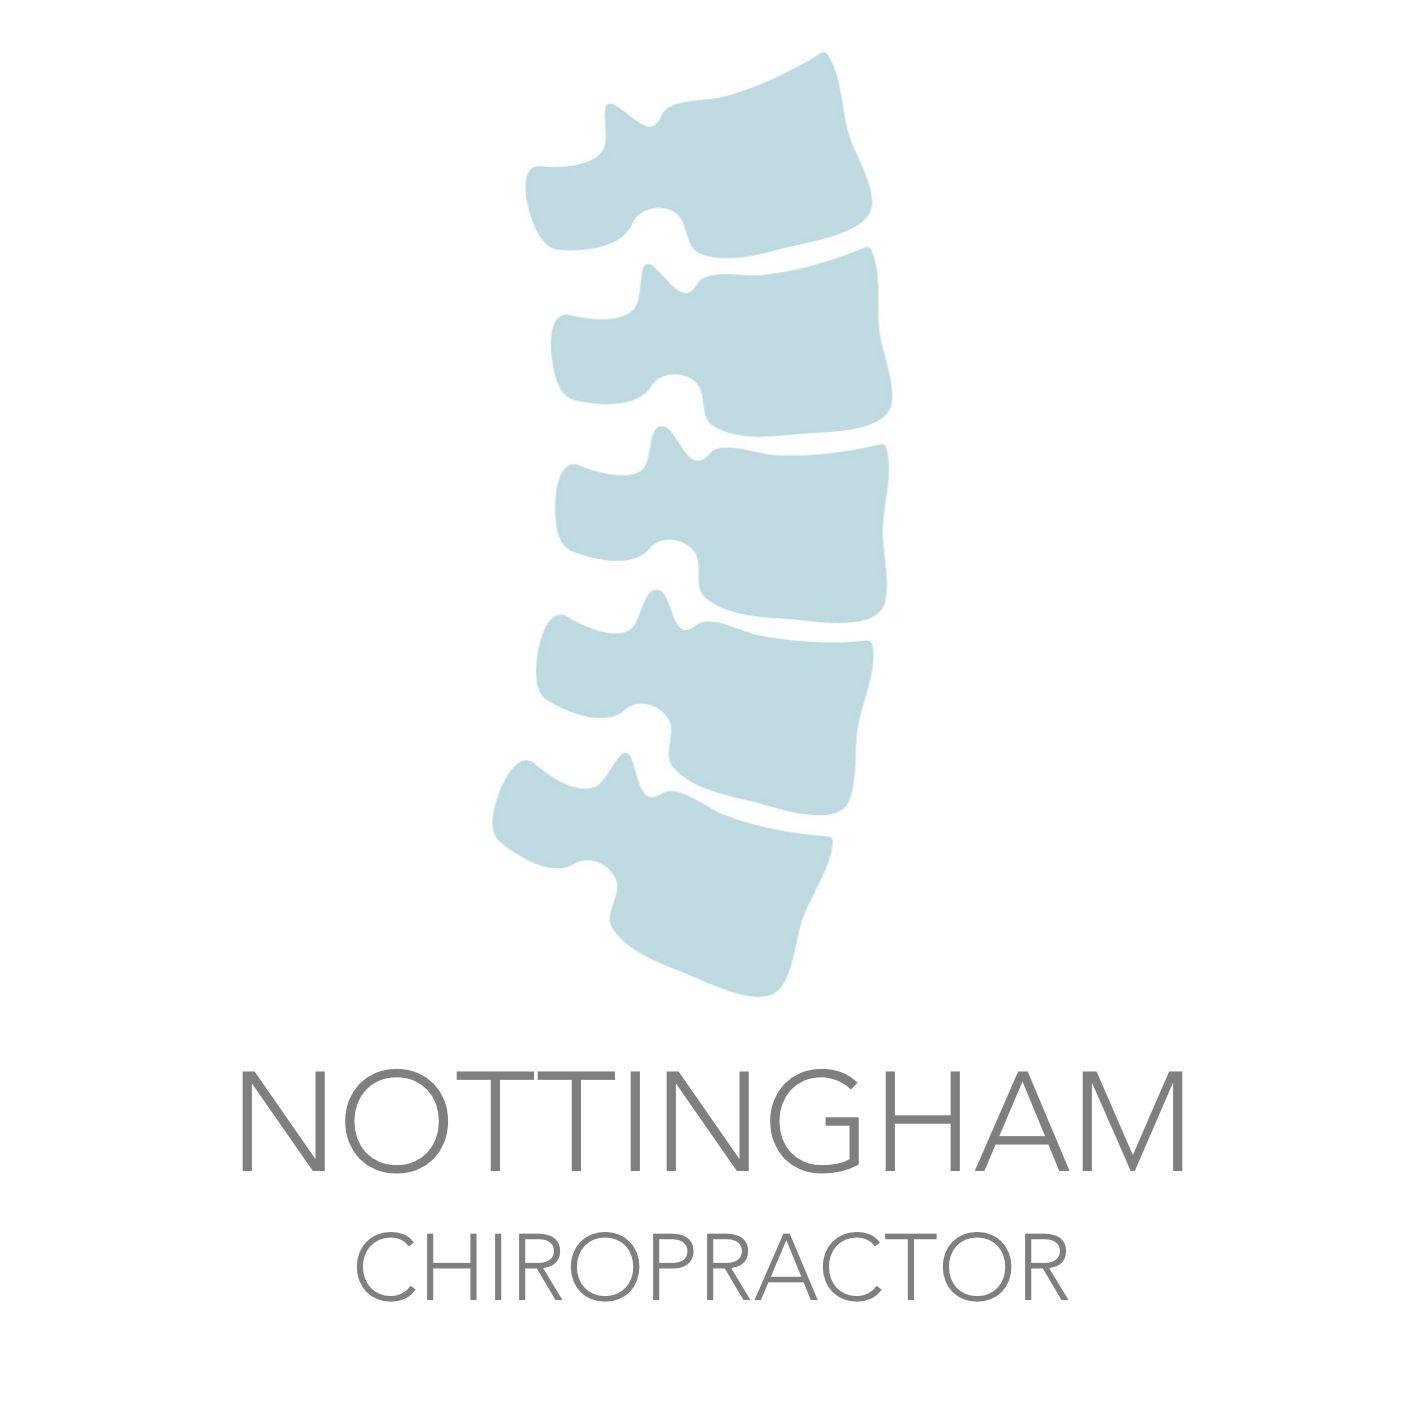 Nottingham Chiropractor